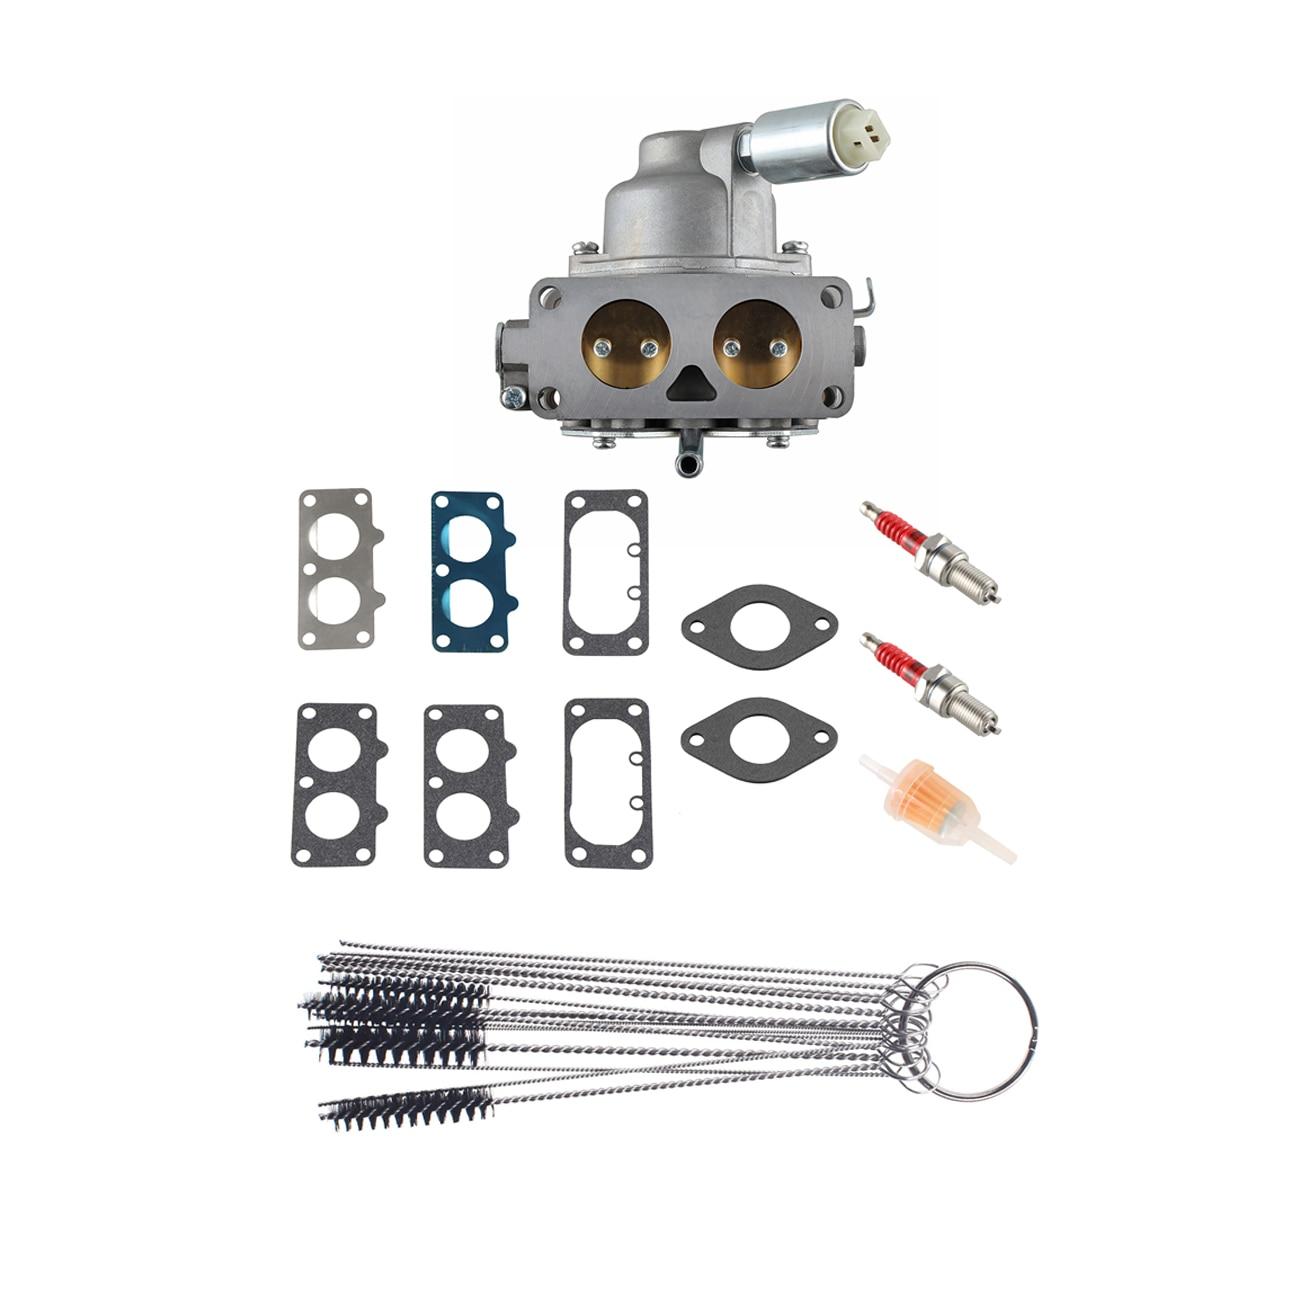 Carburateur Nettoyage Brosse Pour BS 20-25hp 699709 499804 791230 799230